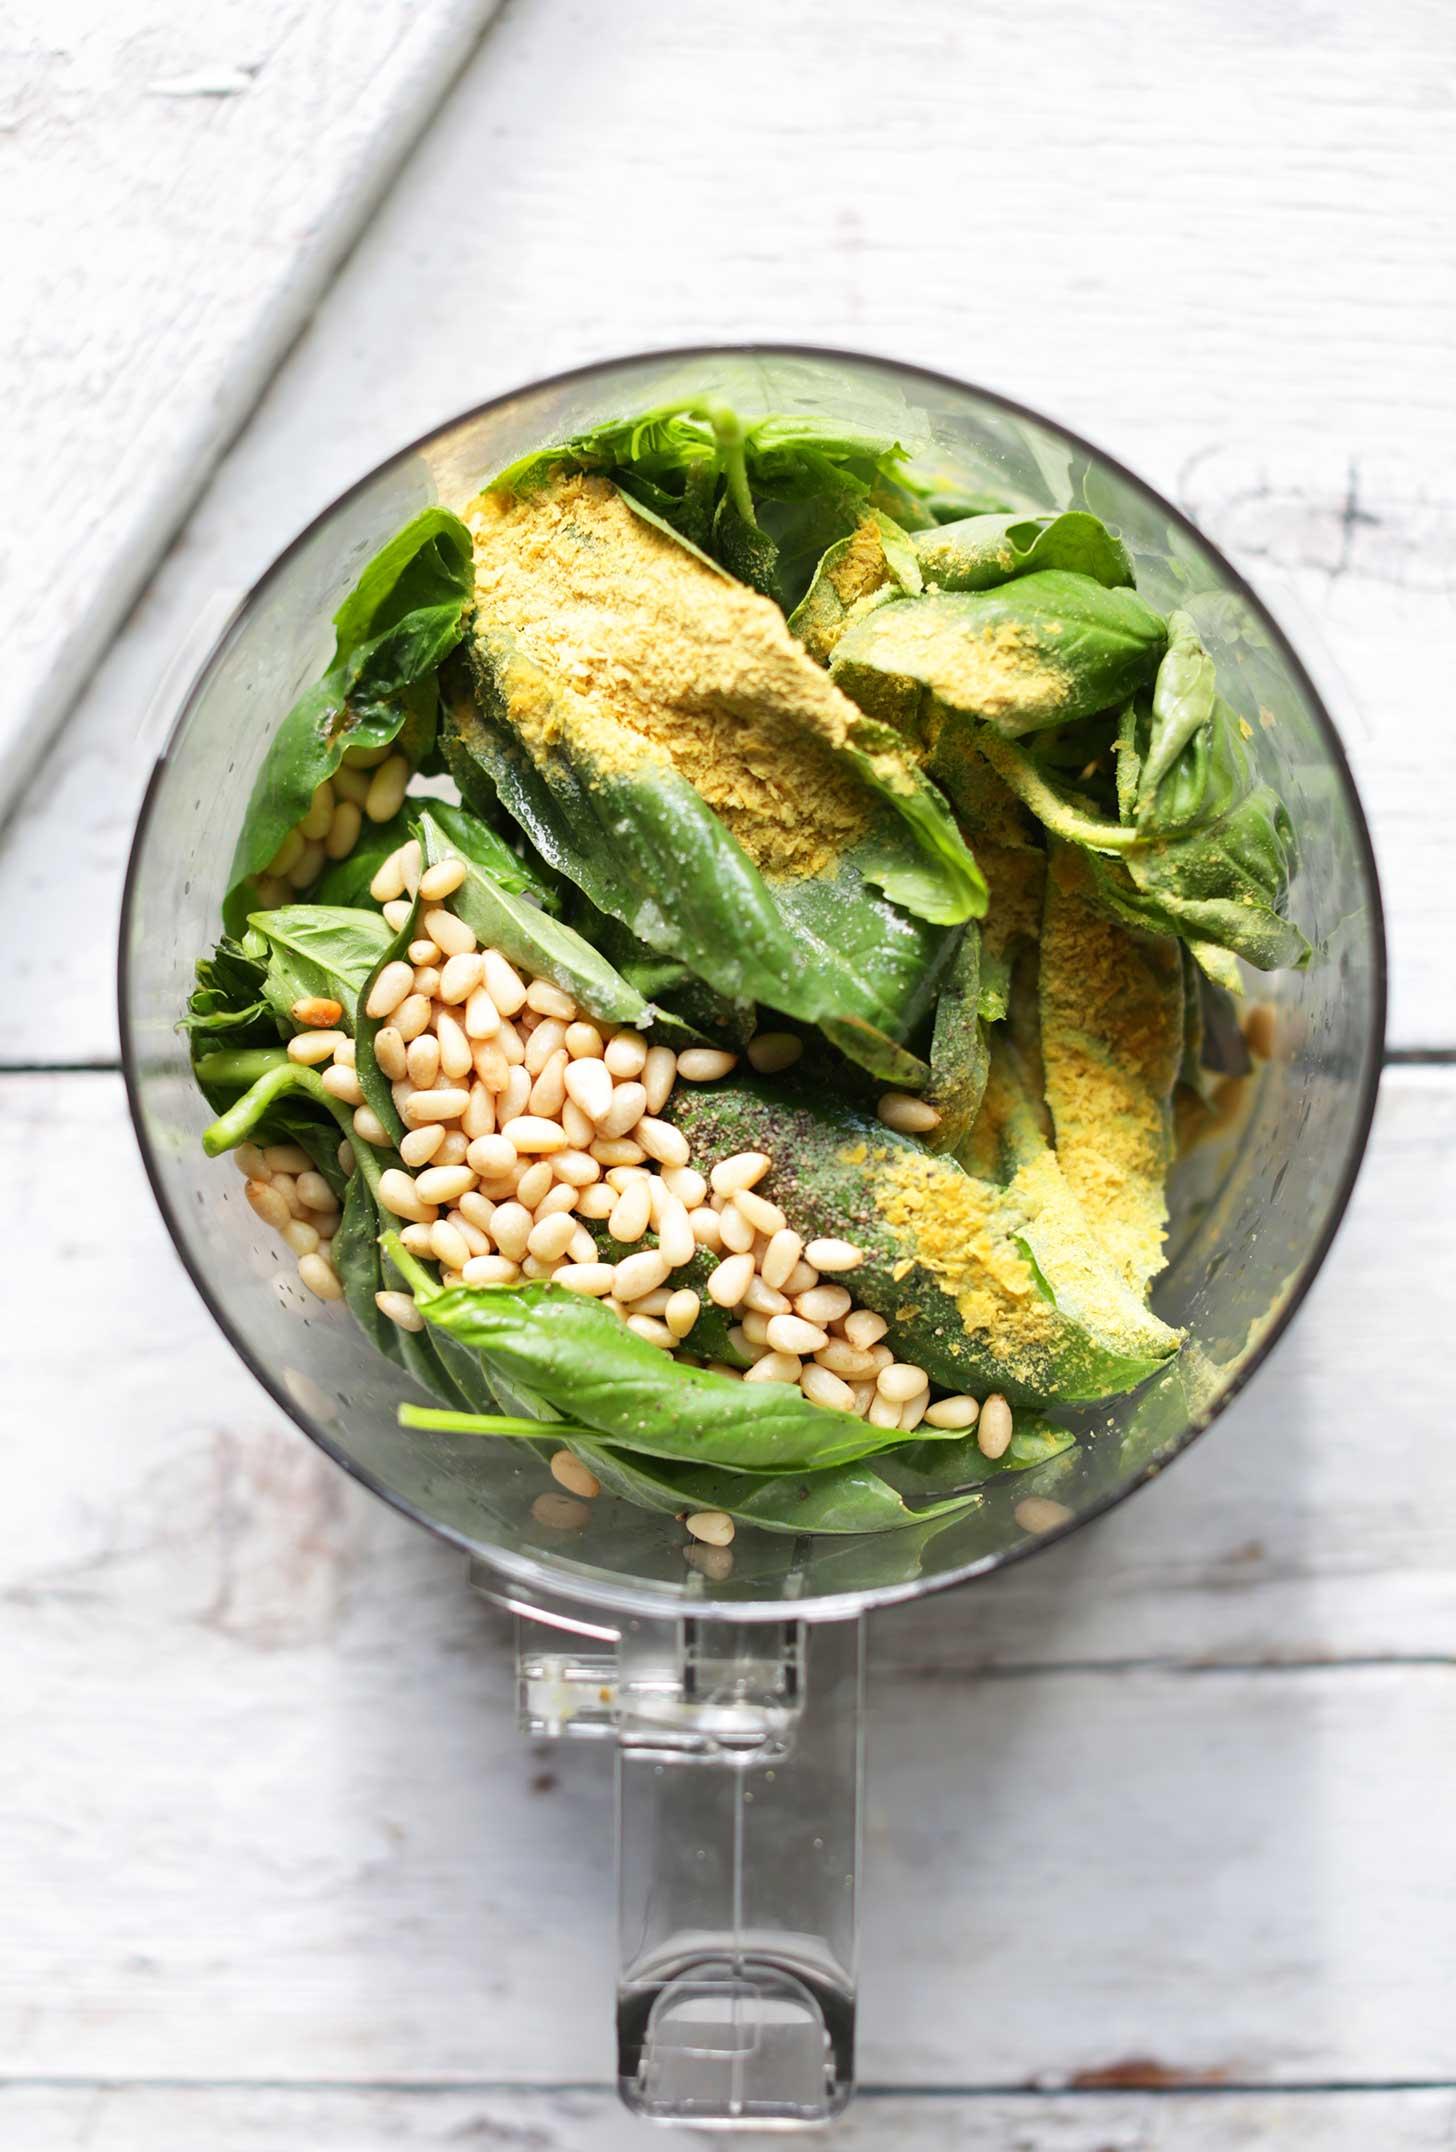 Food processor with ingredients for vegan Garlic Herb Pesto